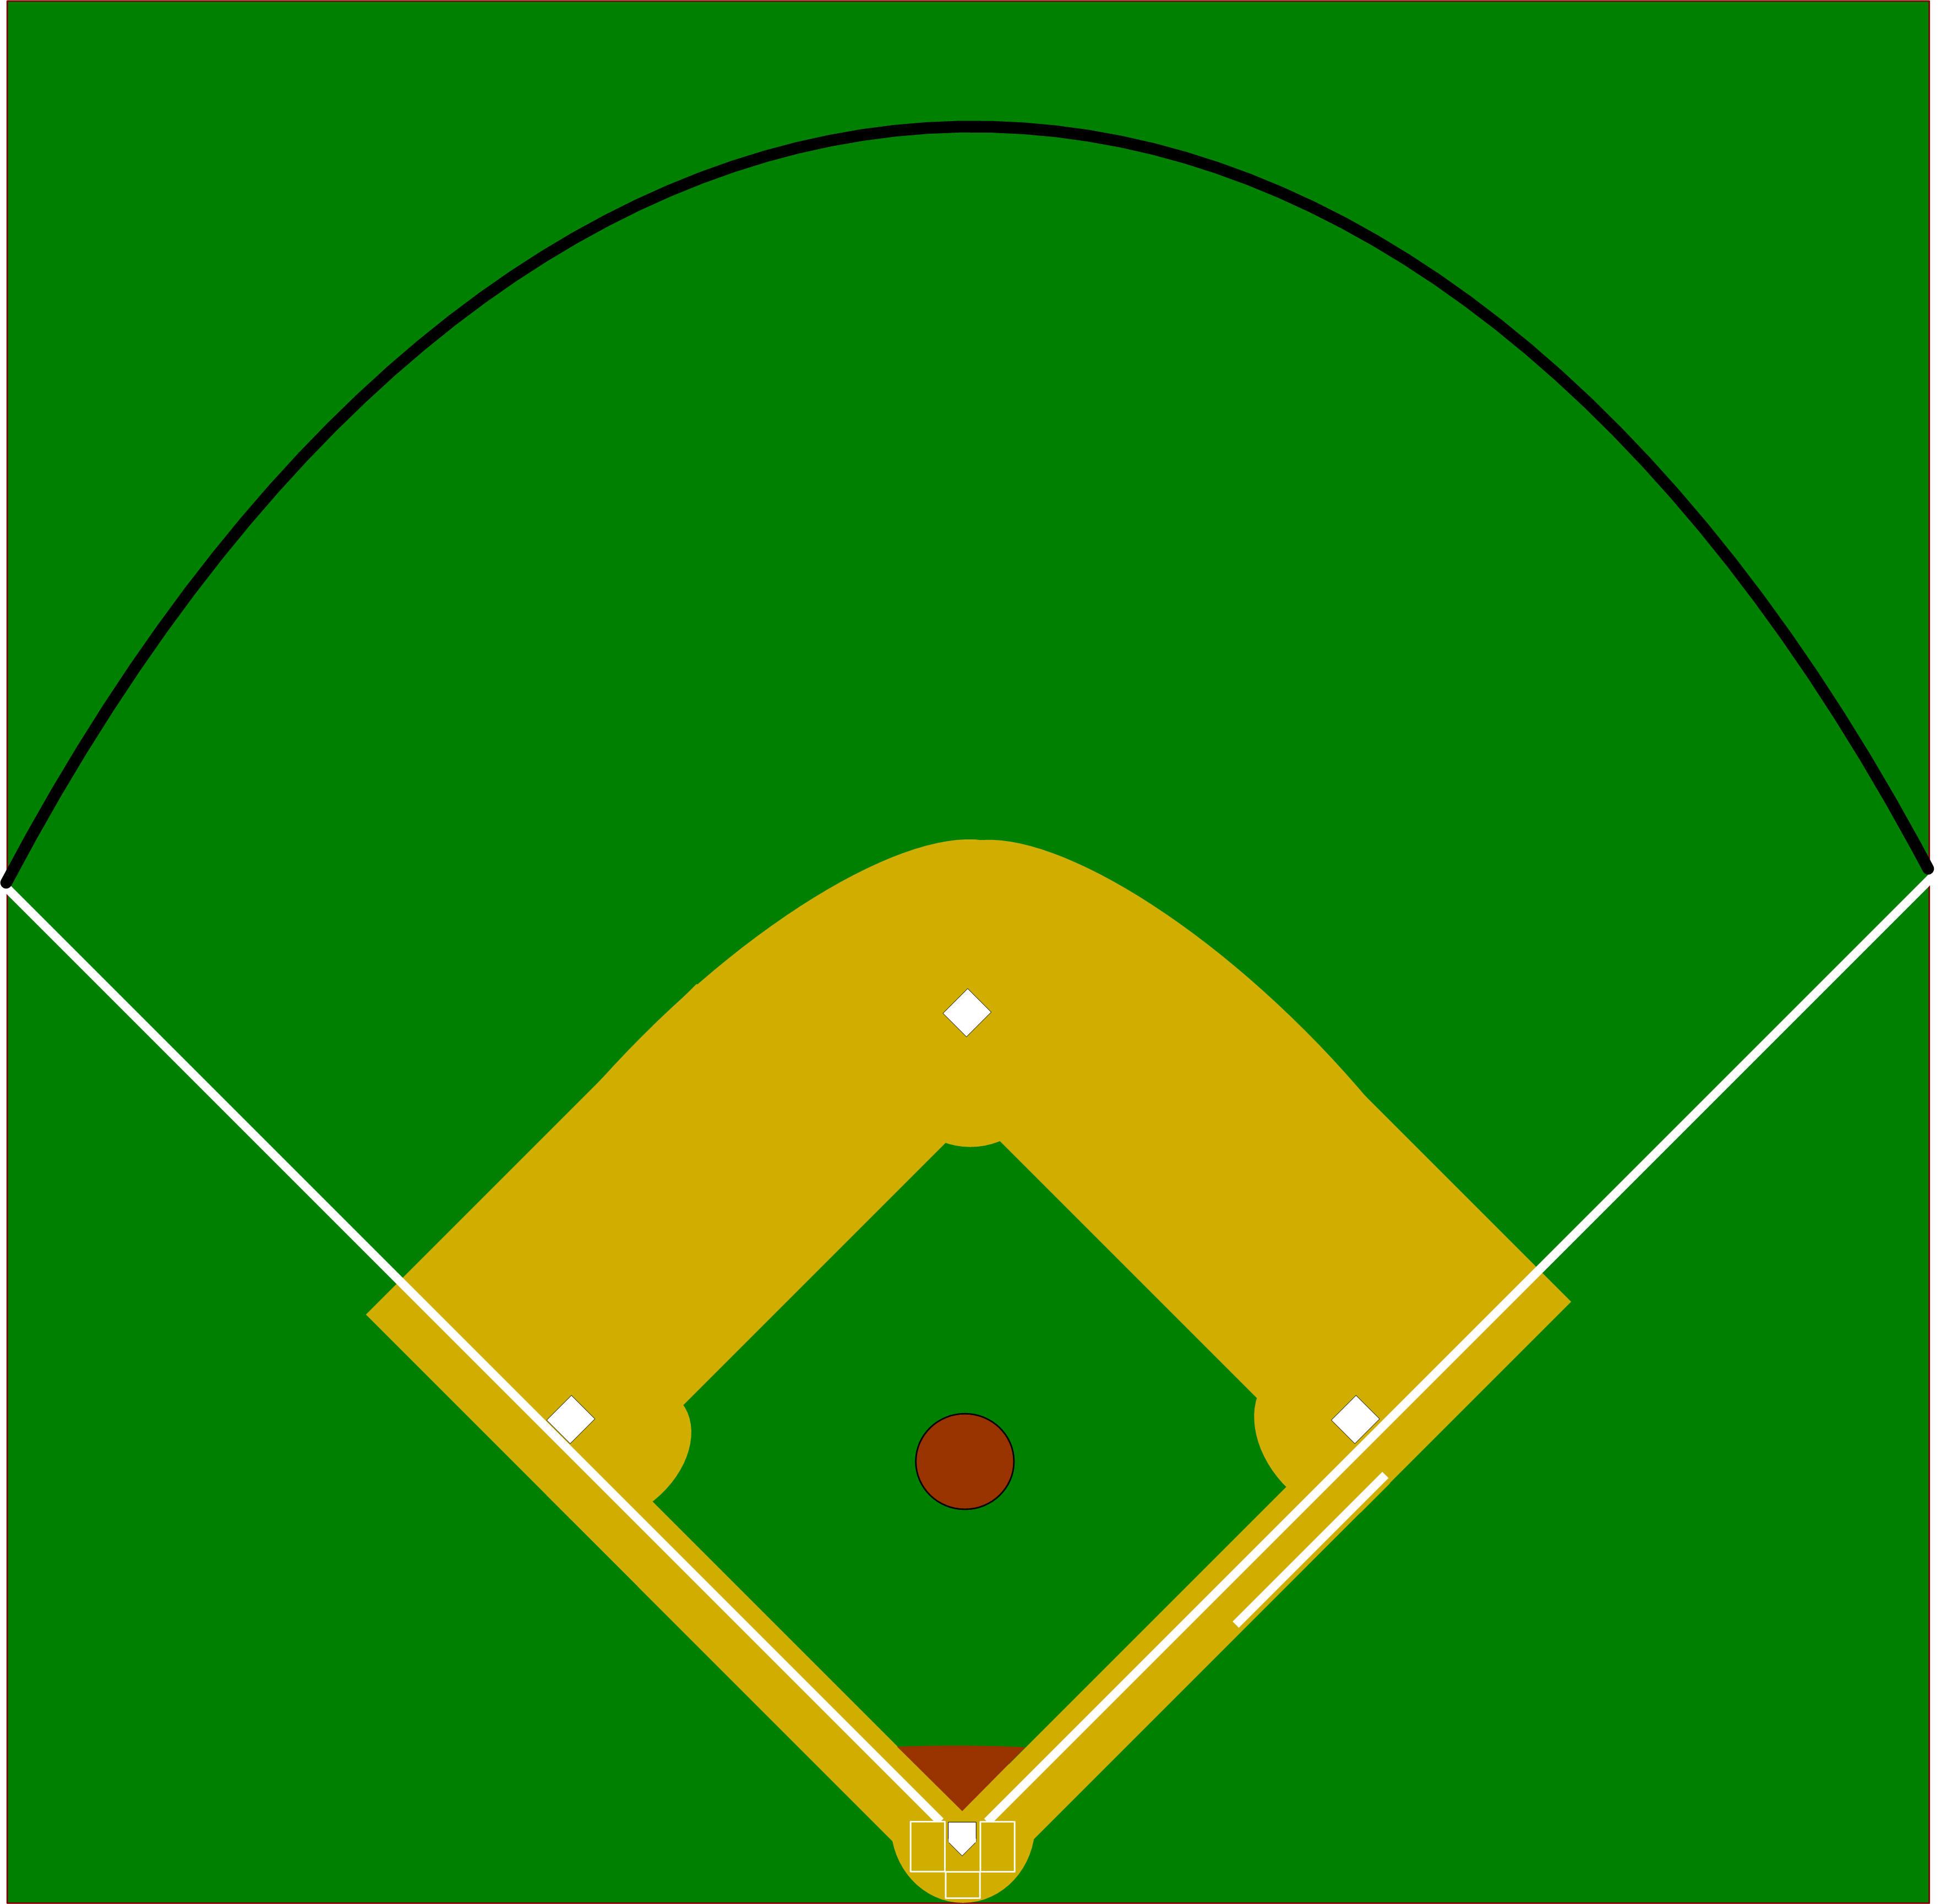 Baseball Field Diagram Blank Baseball Field Diagram Group With 75 Items